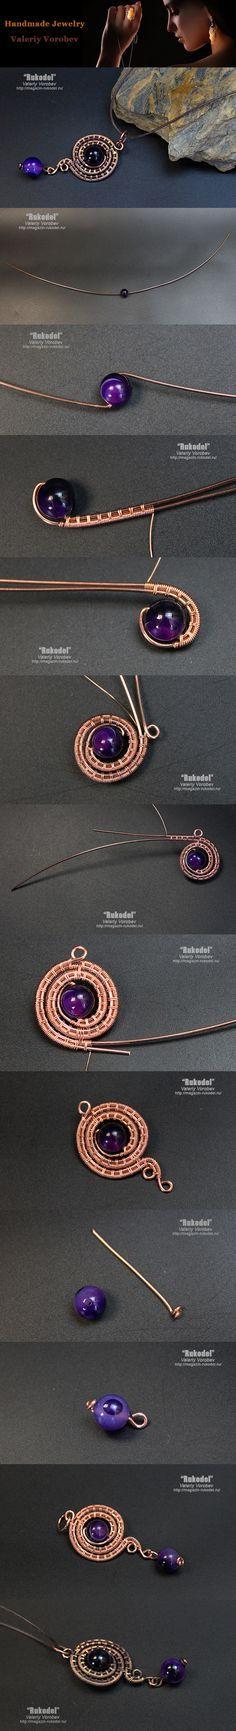 Pendant made of copper wire. Wire Wrap tutorial.